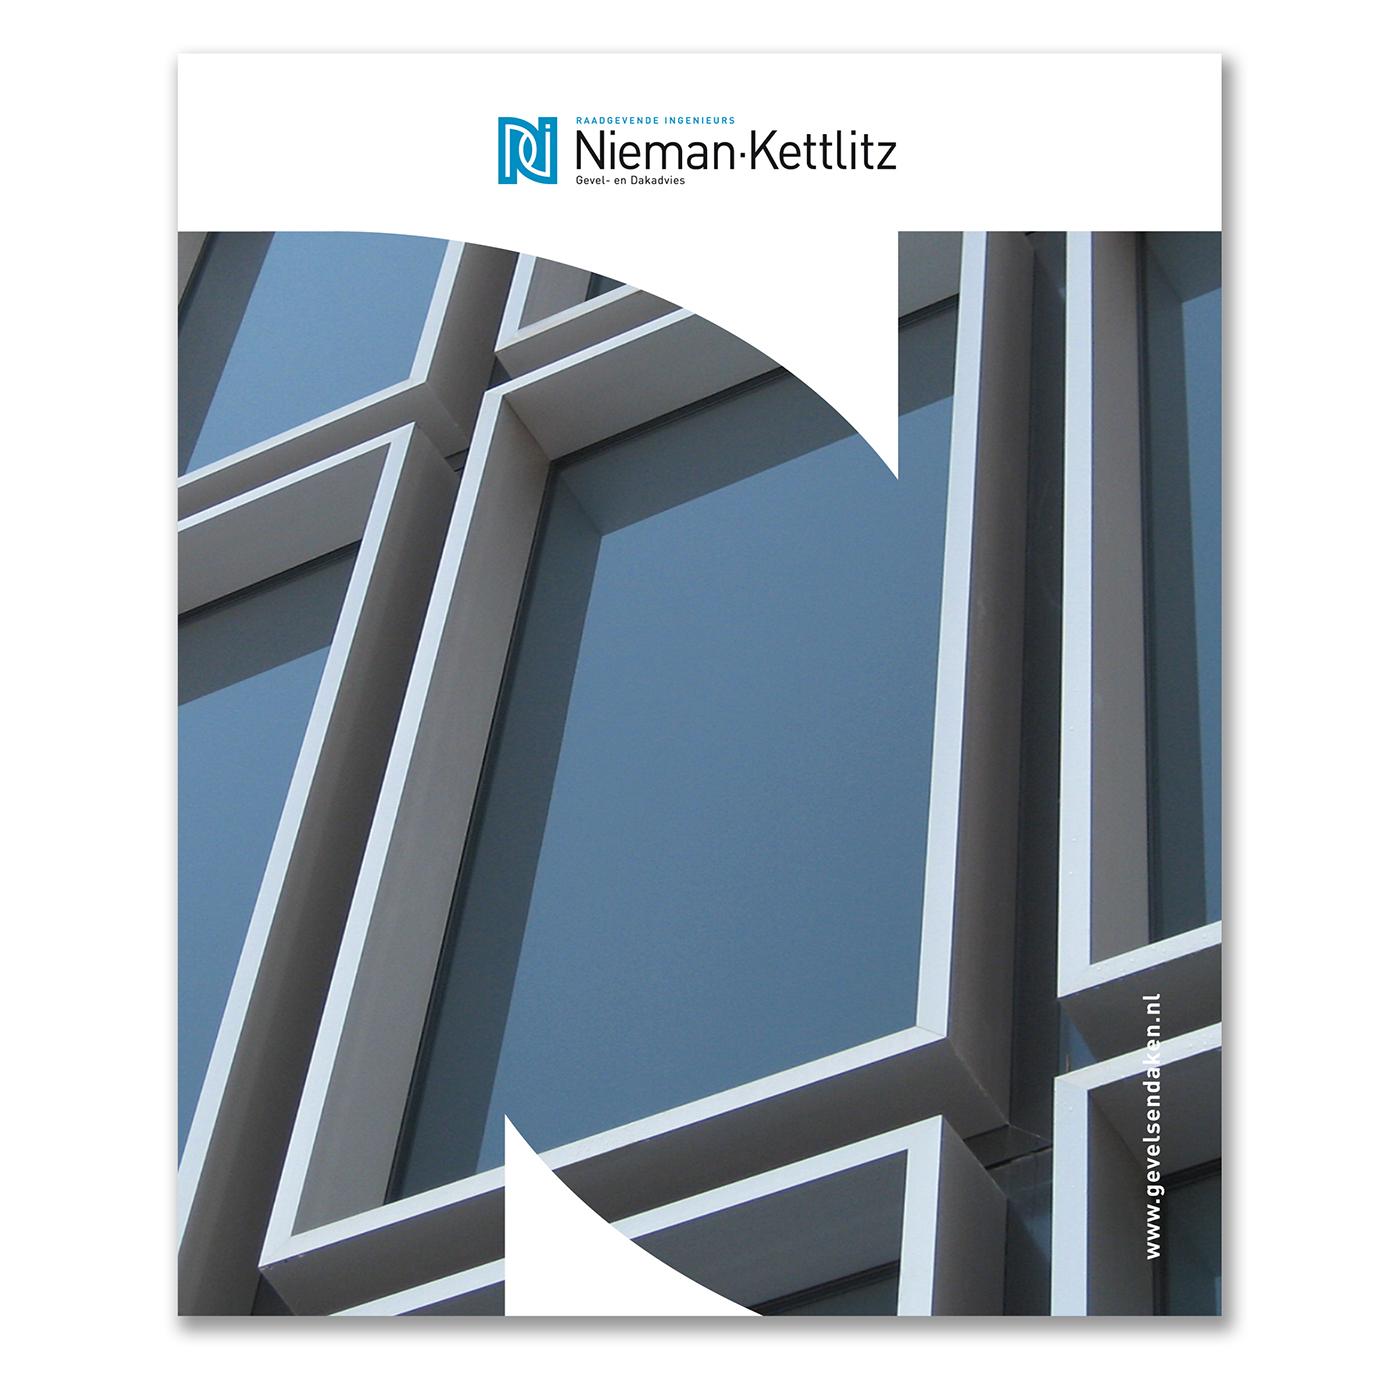 Nieman-Ringband_Nieman-Kettlitz_def